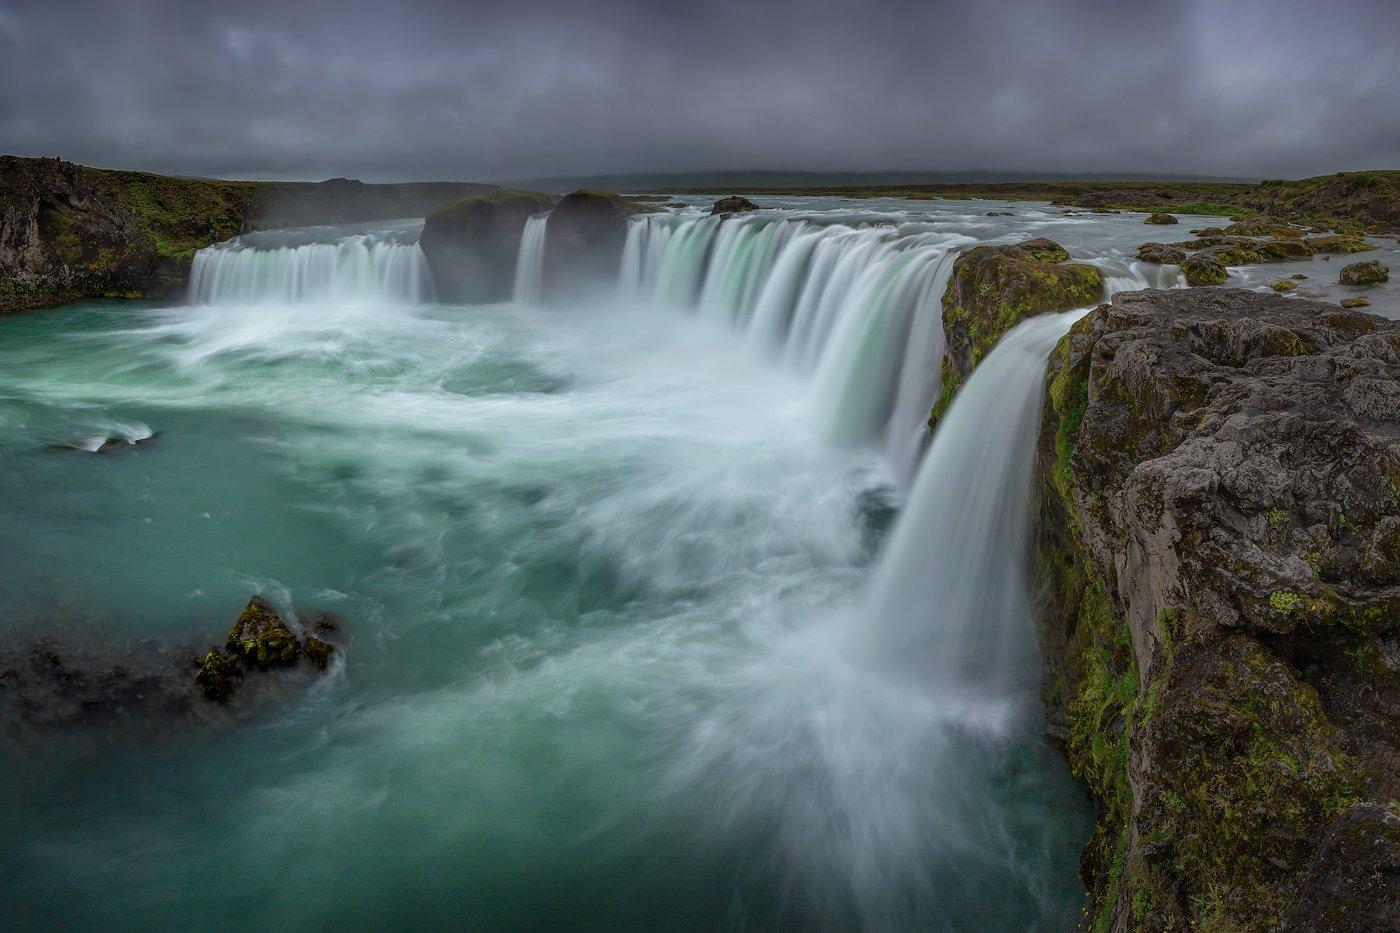 исландия, iceland, goðafoss, годаффос, waterfall, водопад, Шевченко Юрий